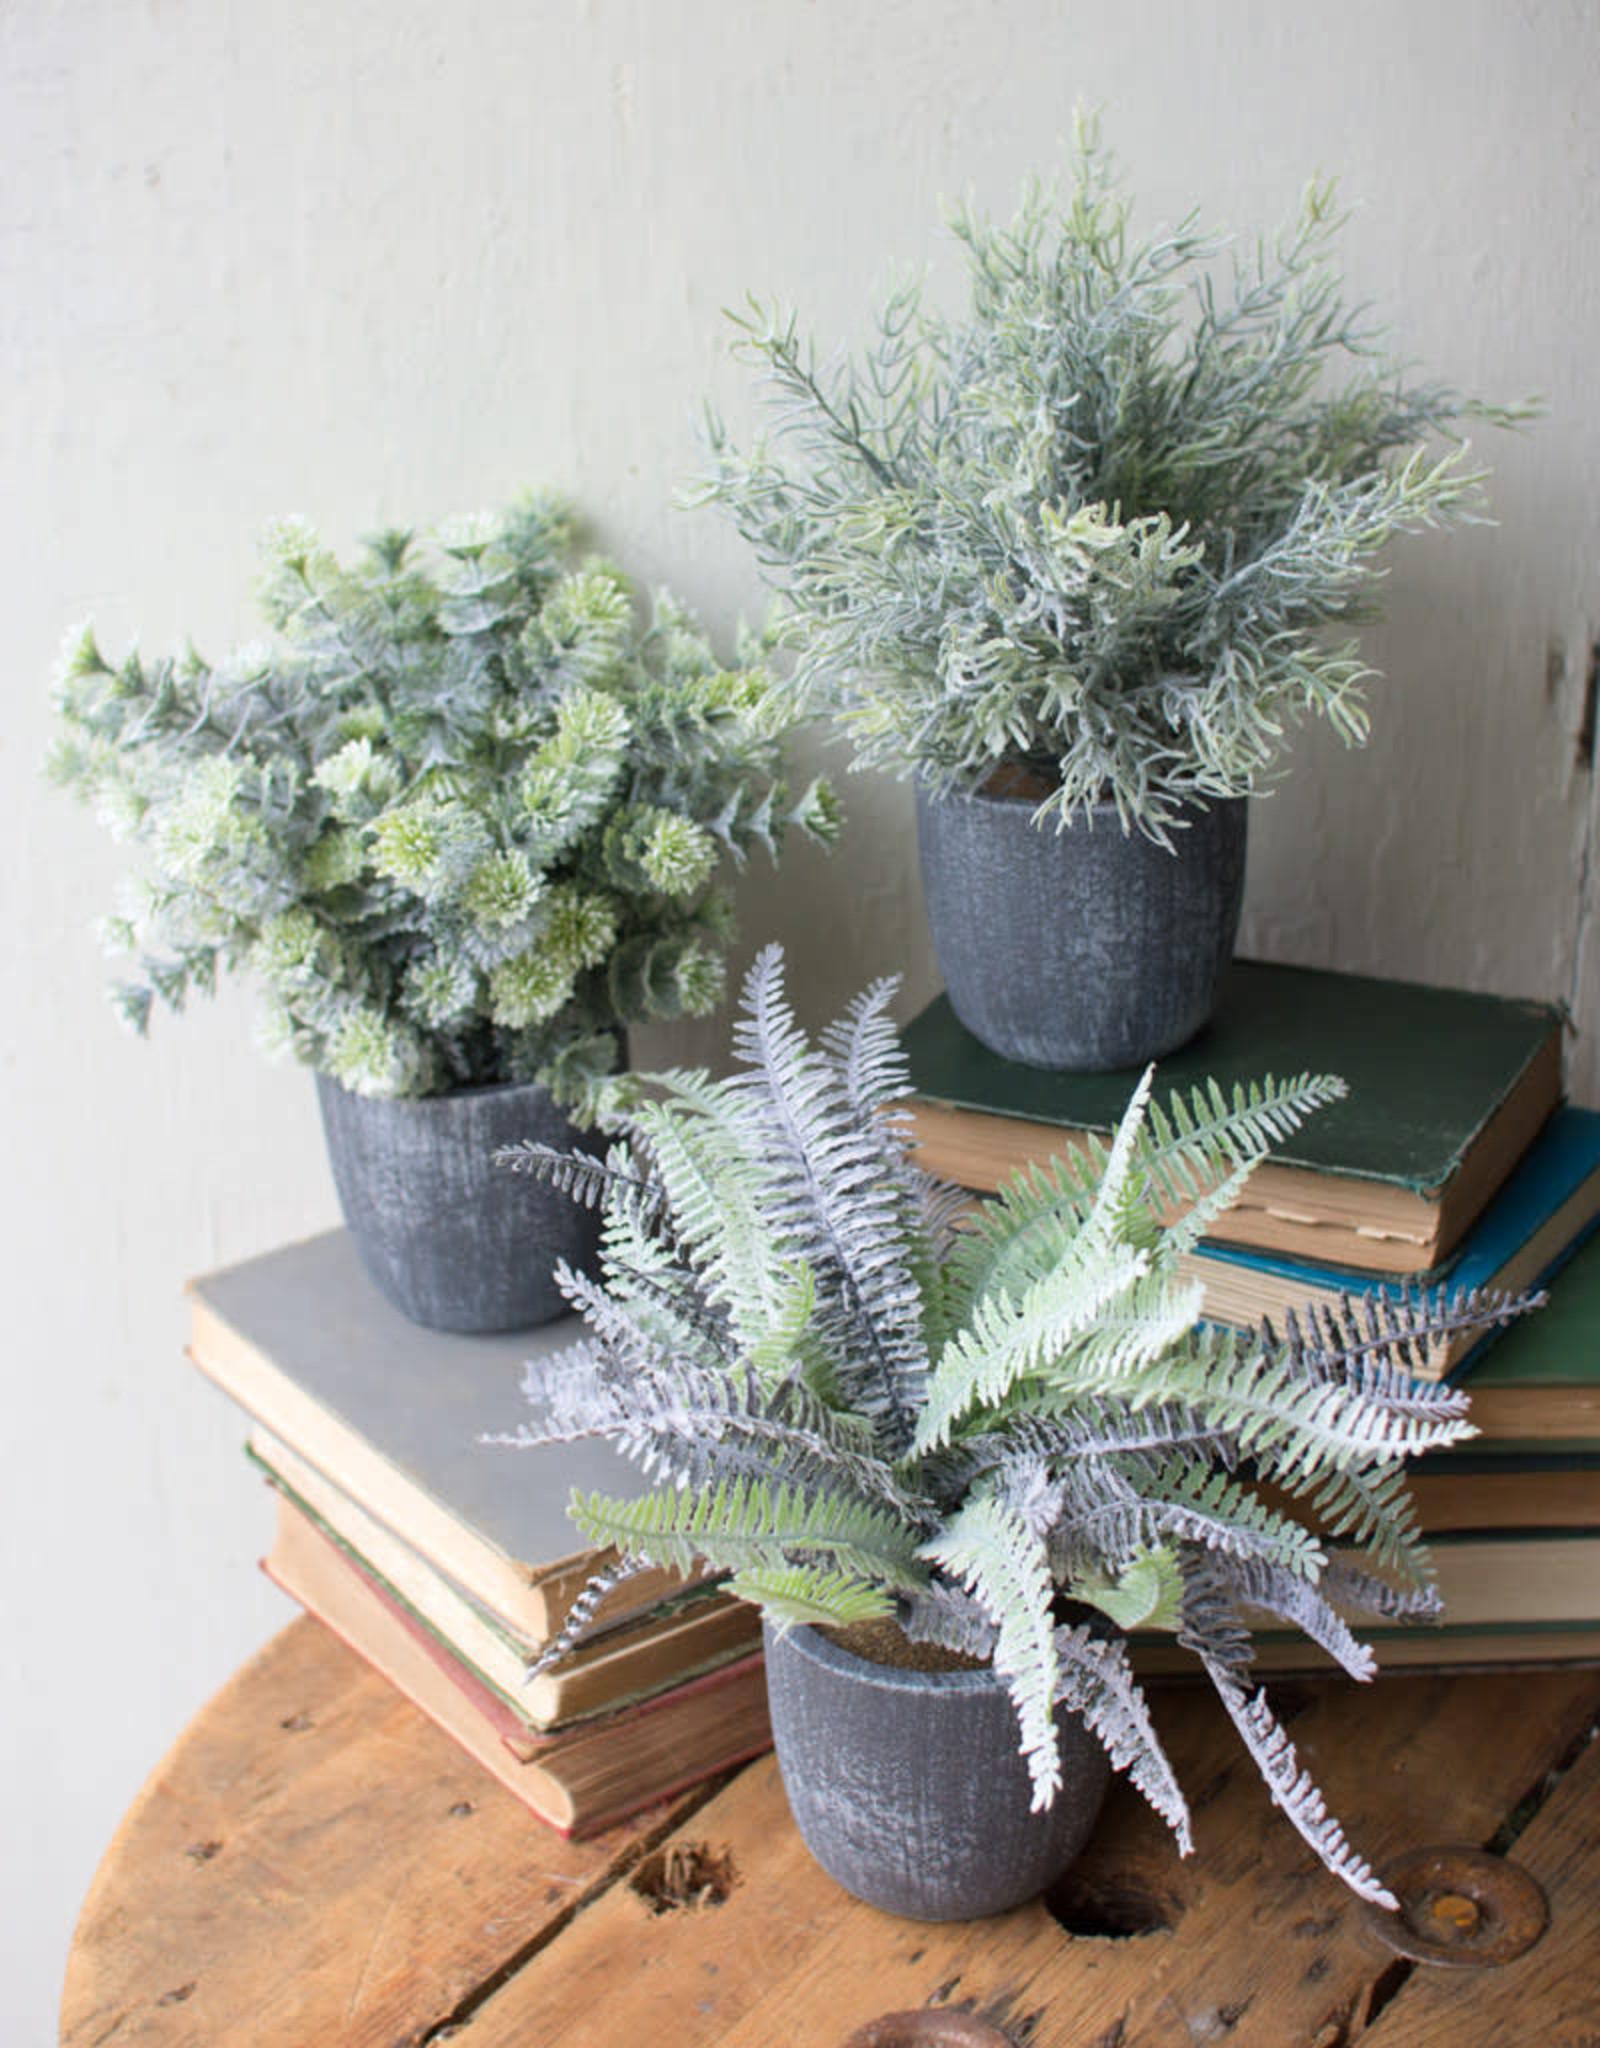 Kalalou Fern Succulent with round grey pots